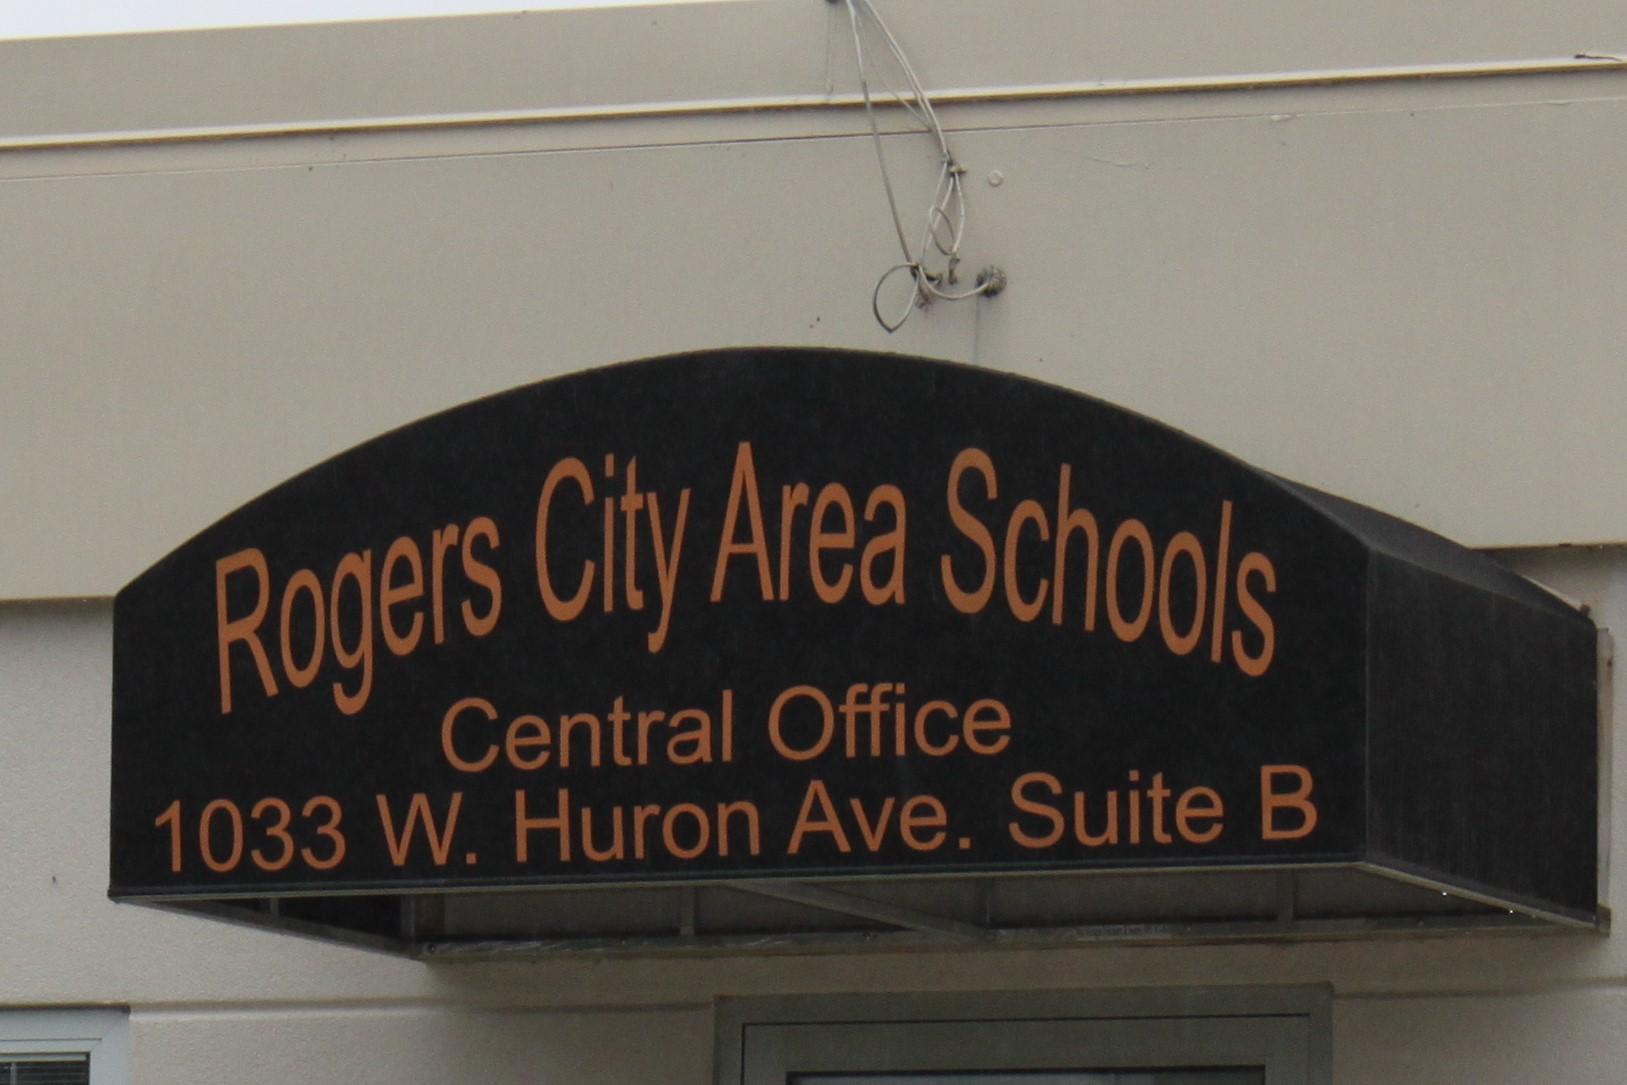 Rogers City Area Schools - 1033 W. Huron Ave, Rogers City, MI 49779(989) 734-9170